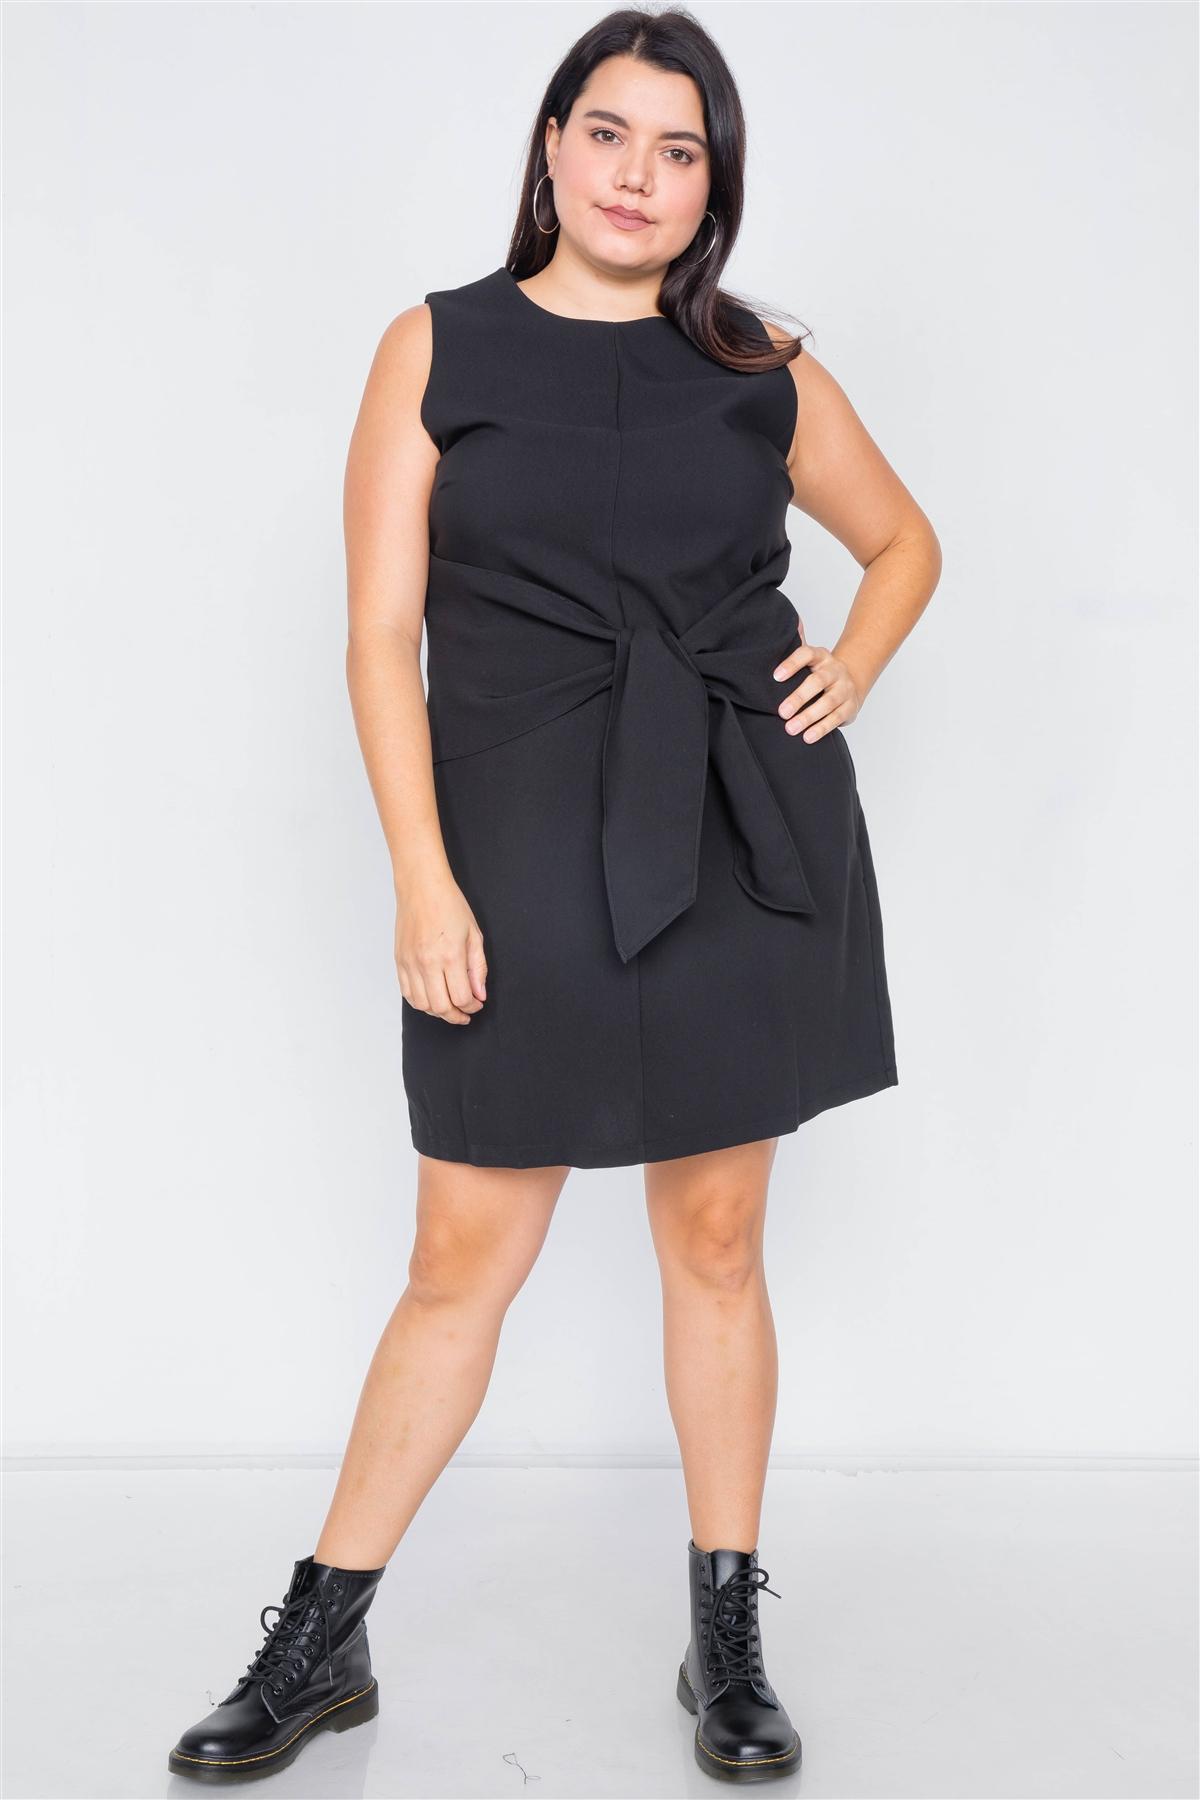 Plus Size Black Round Neck Tank Top Mini Wrap Dress